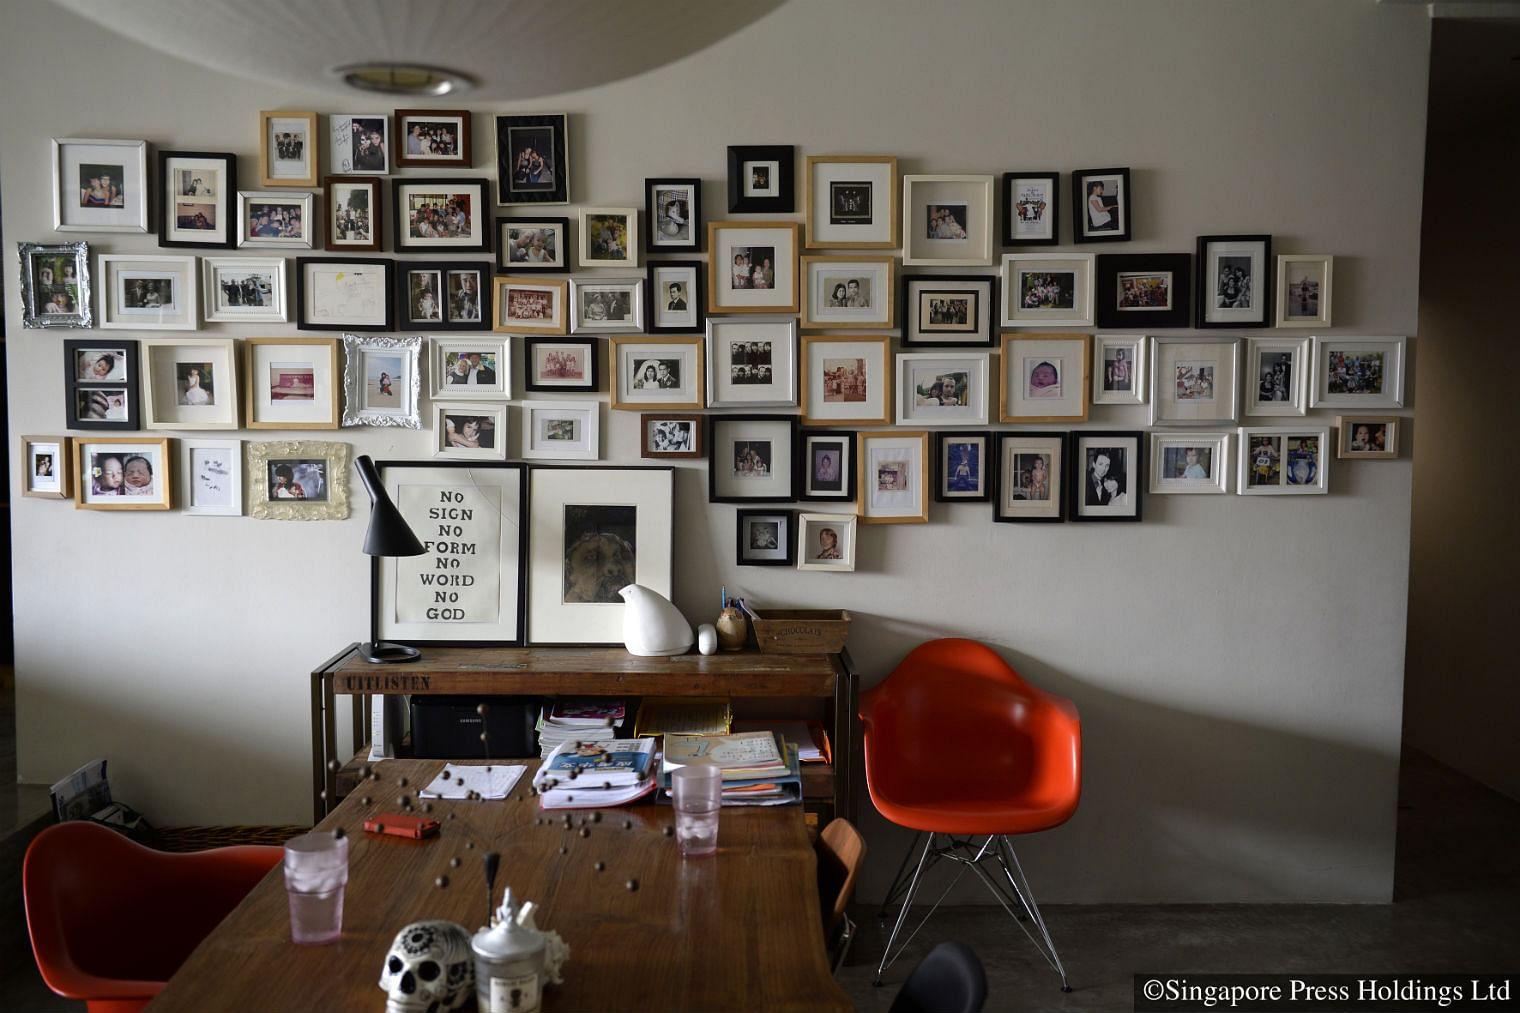 79529-ling-wu-toh-tuck-wall-frames